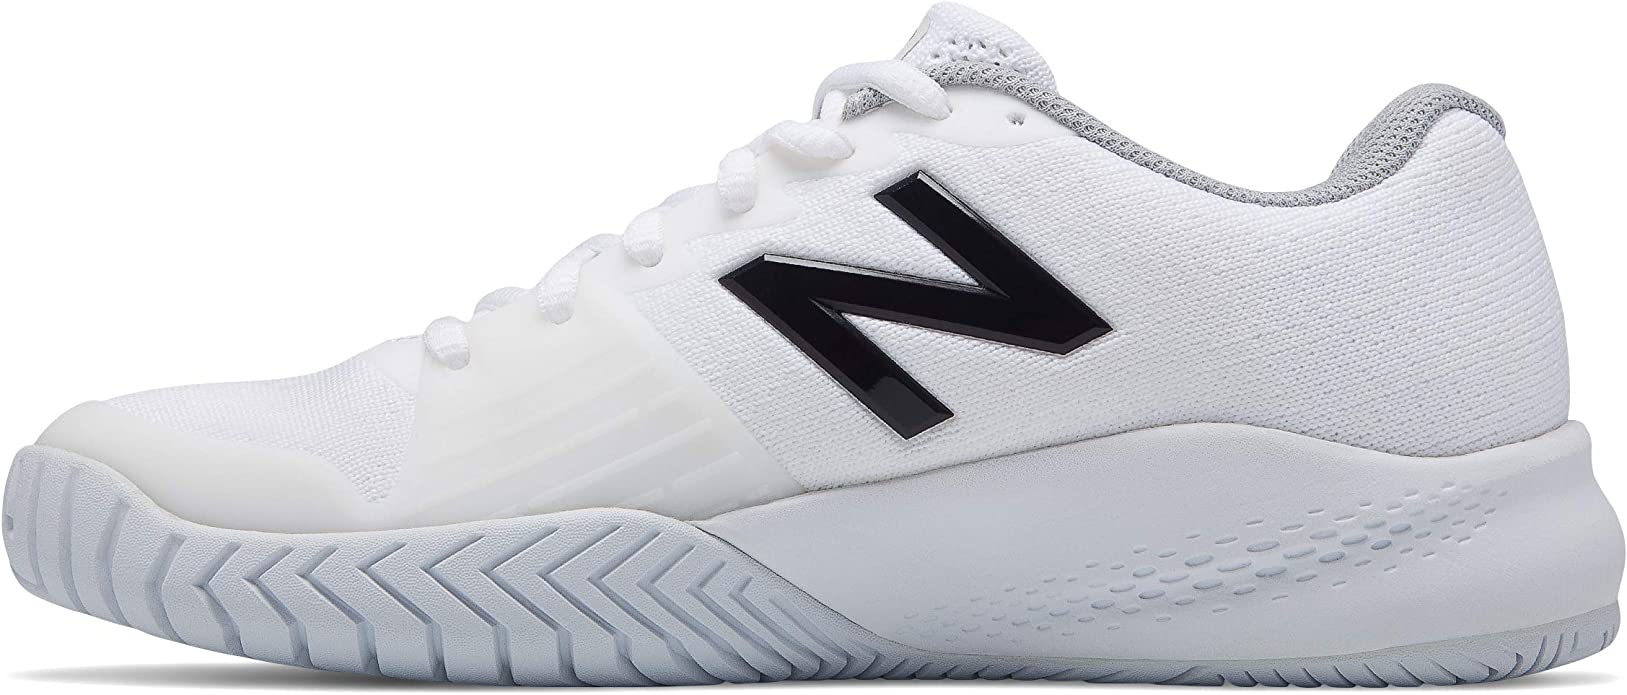 New Balance Womens 996v3 Tennis Shoe